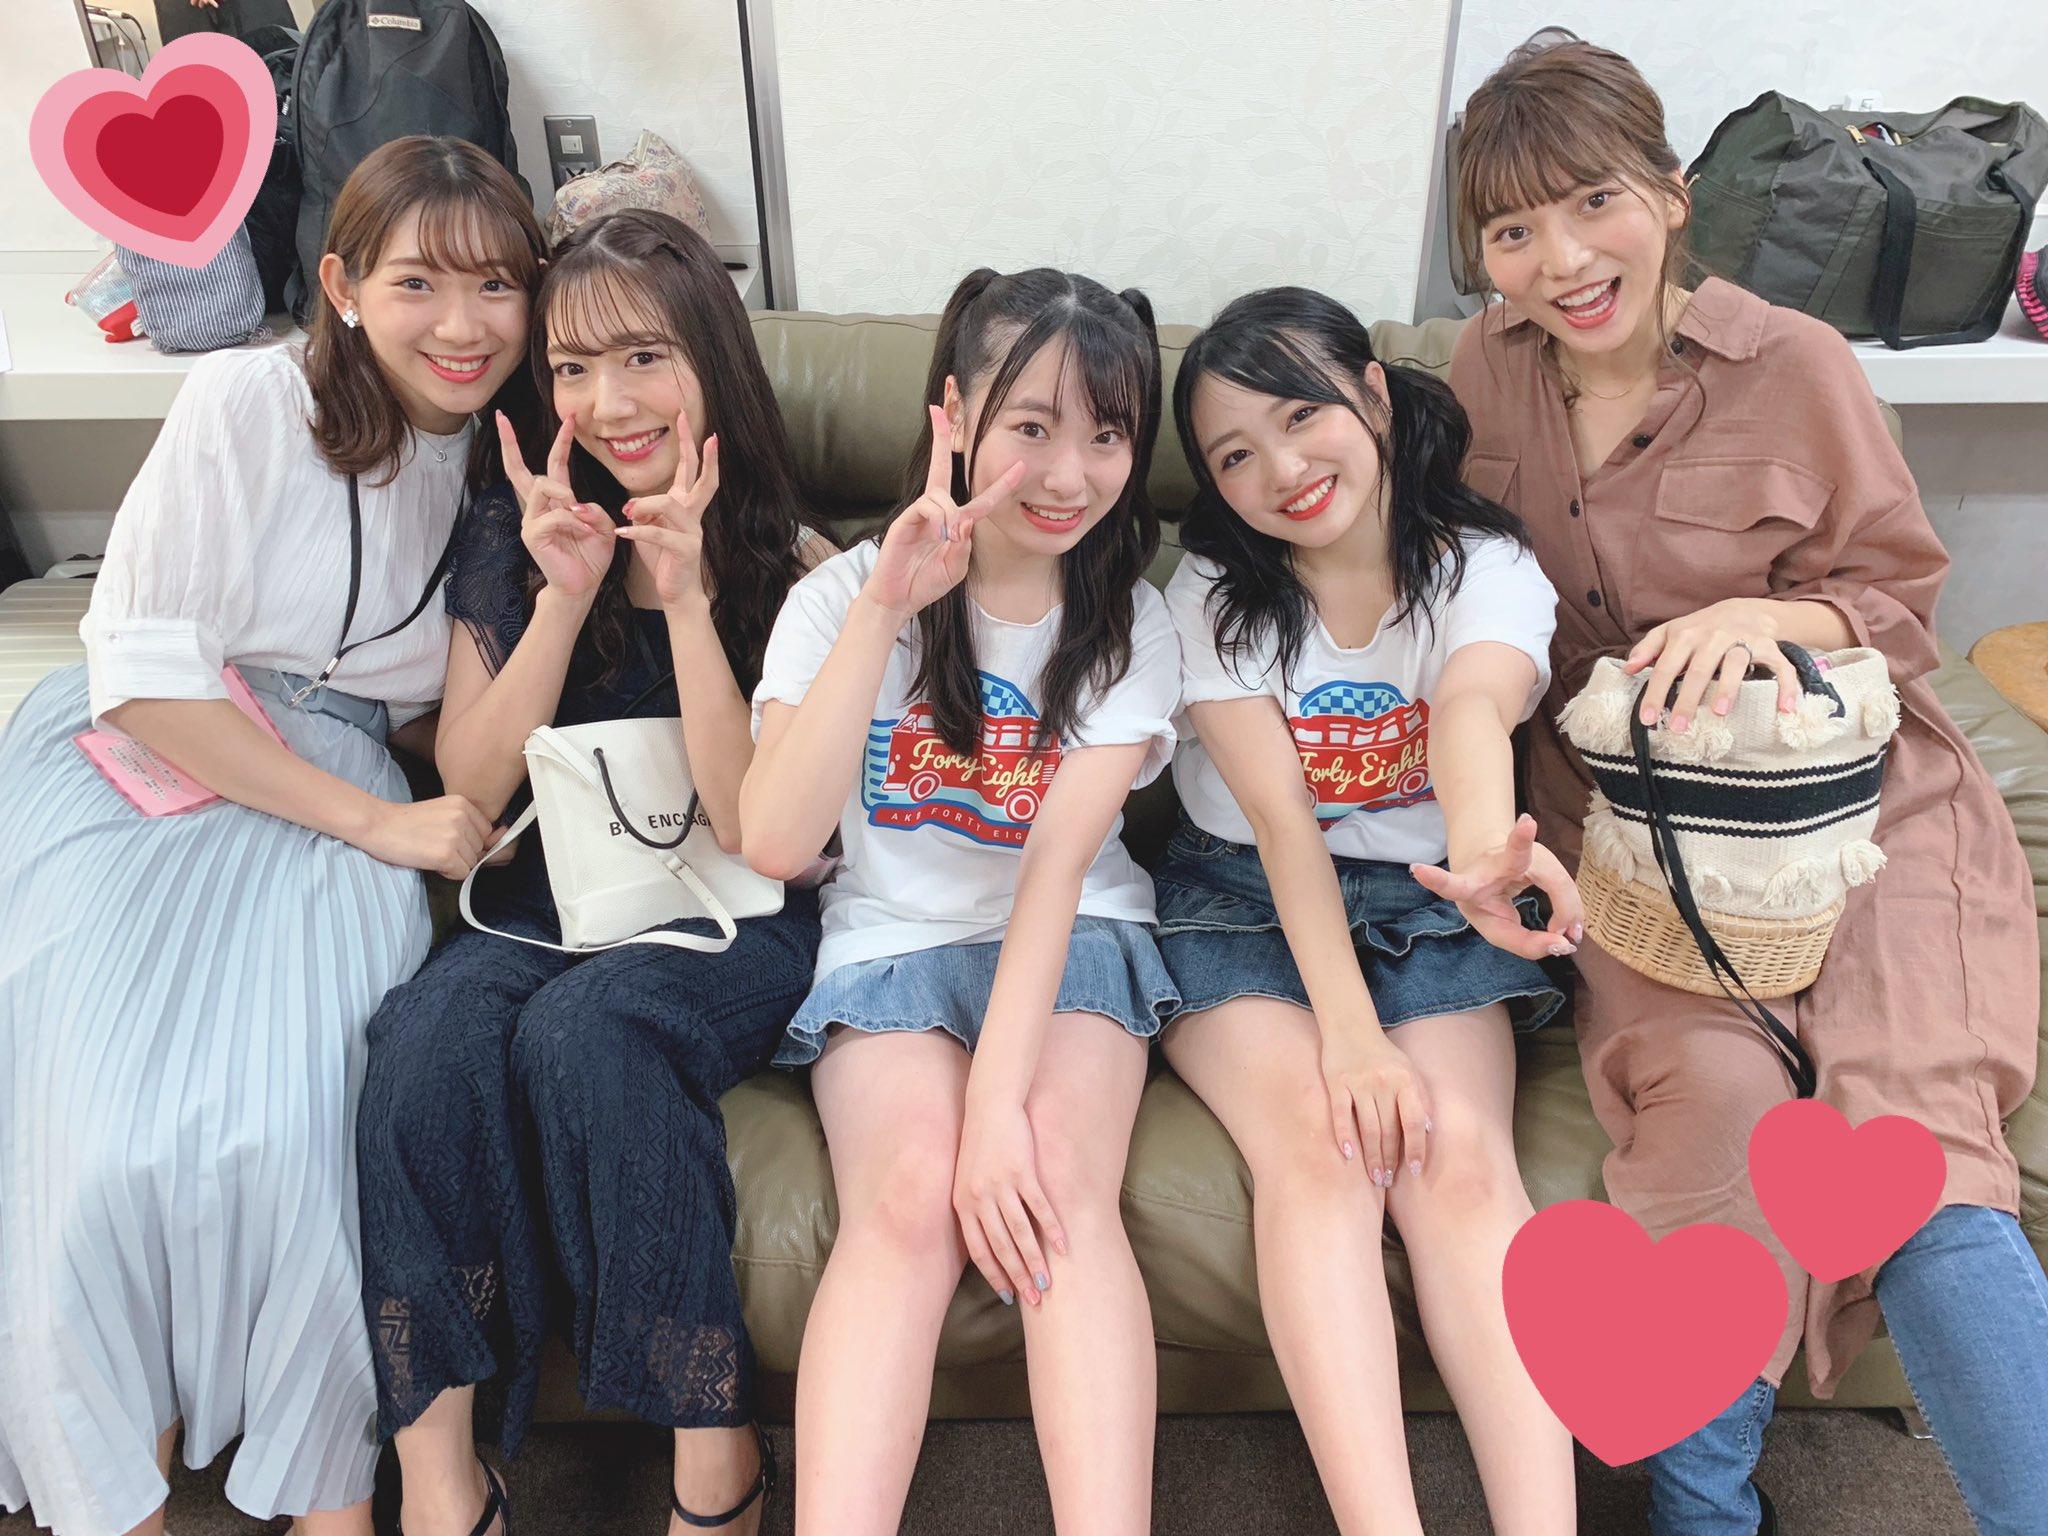 AKB48タイムズ(AKB48まとめ) : 野中美郷 - livedoor Blog(ブログ)